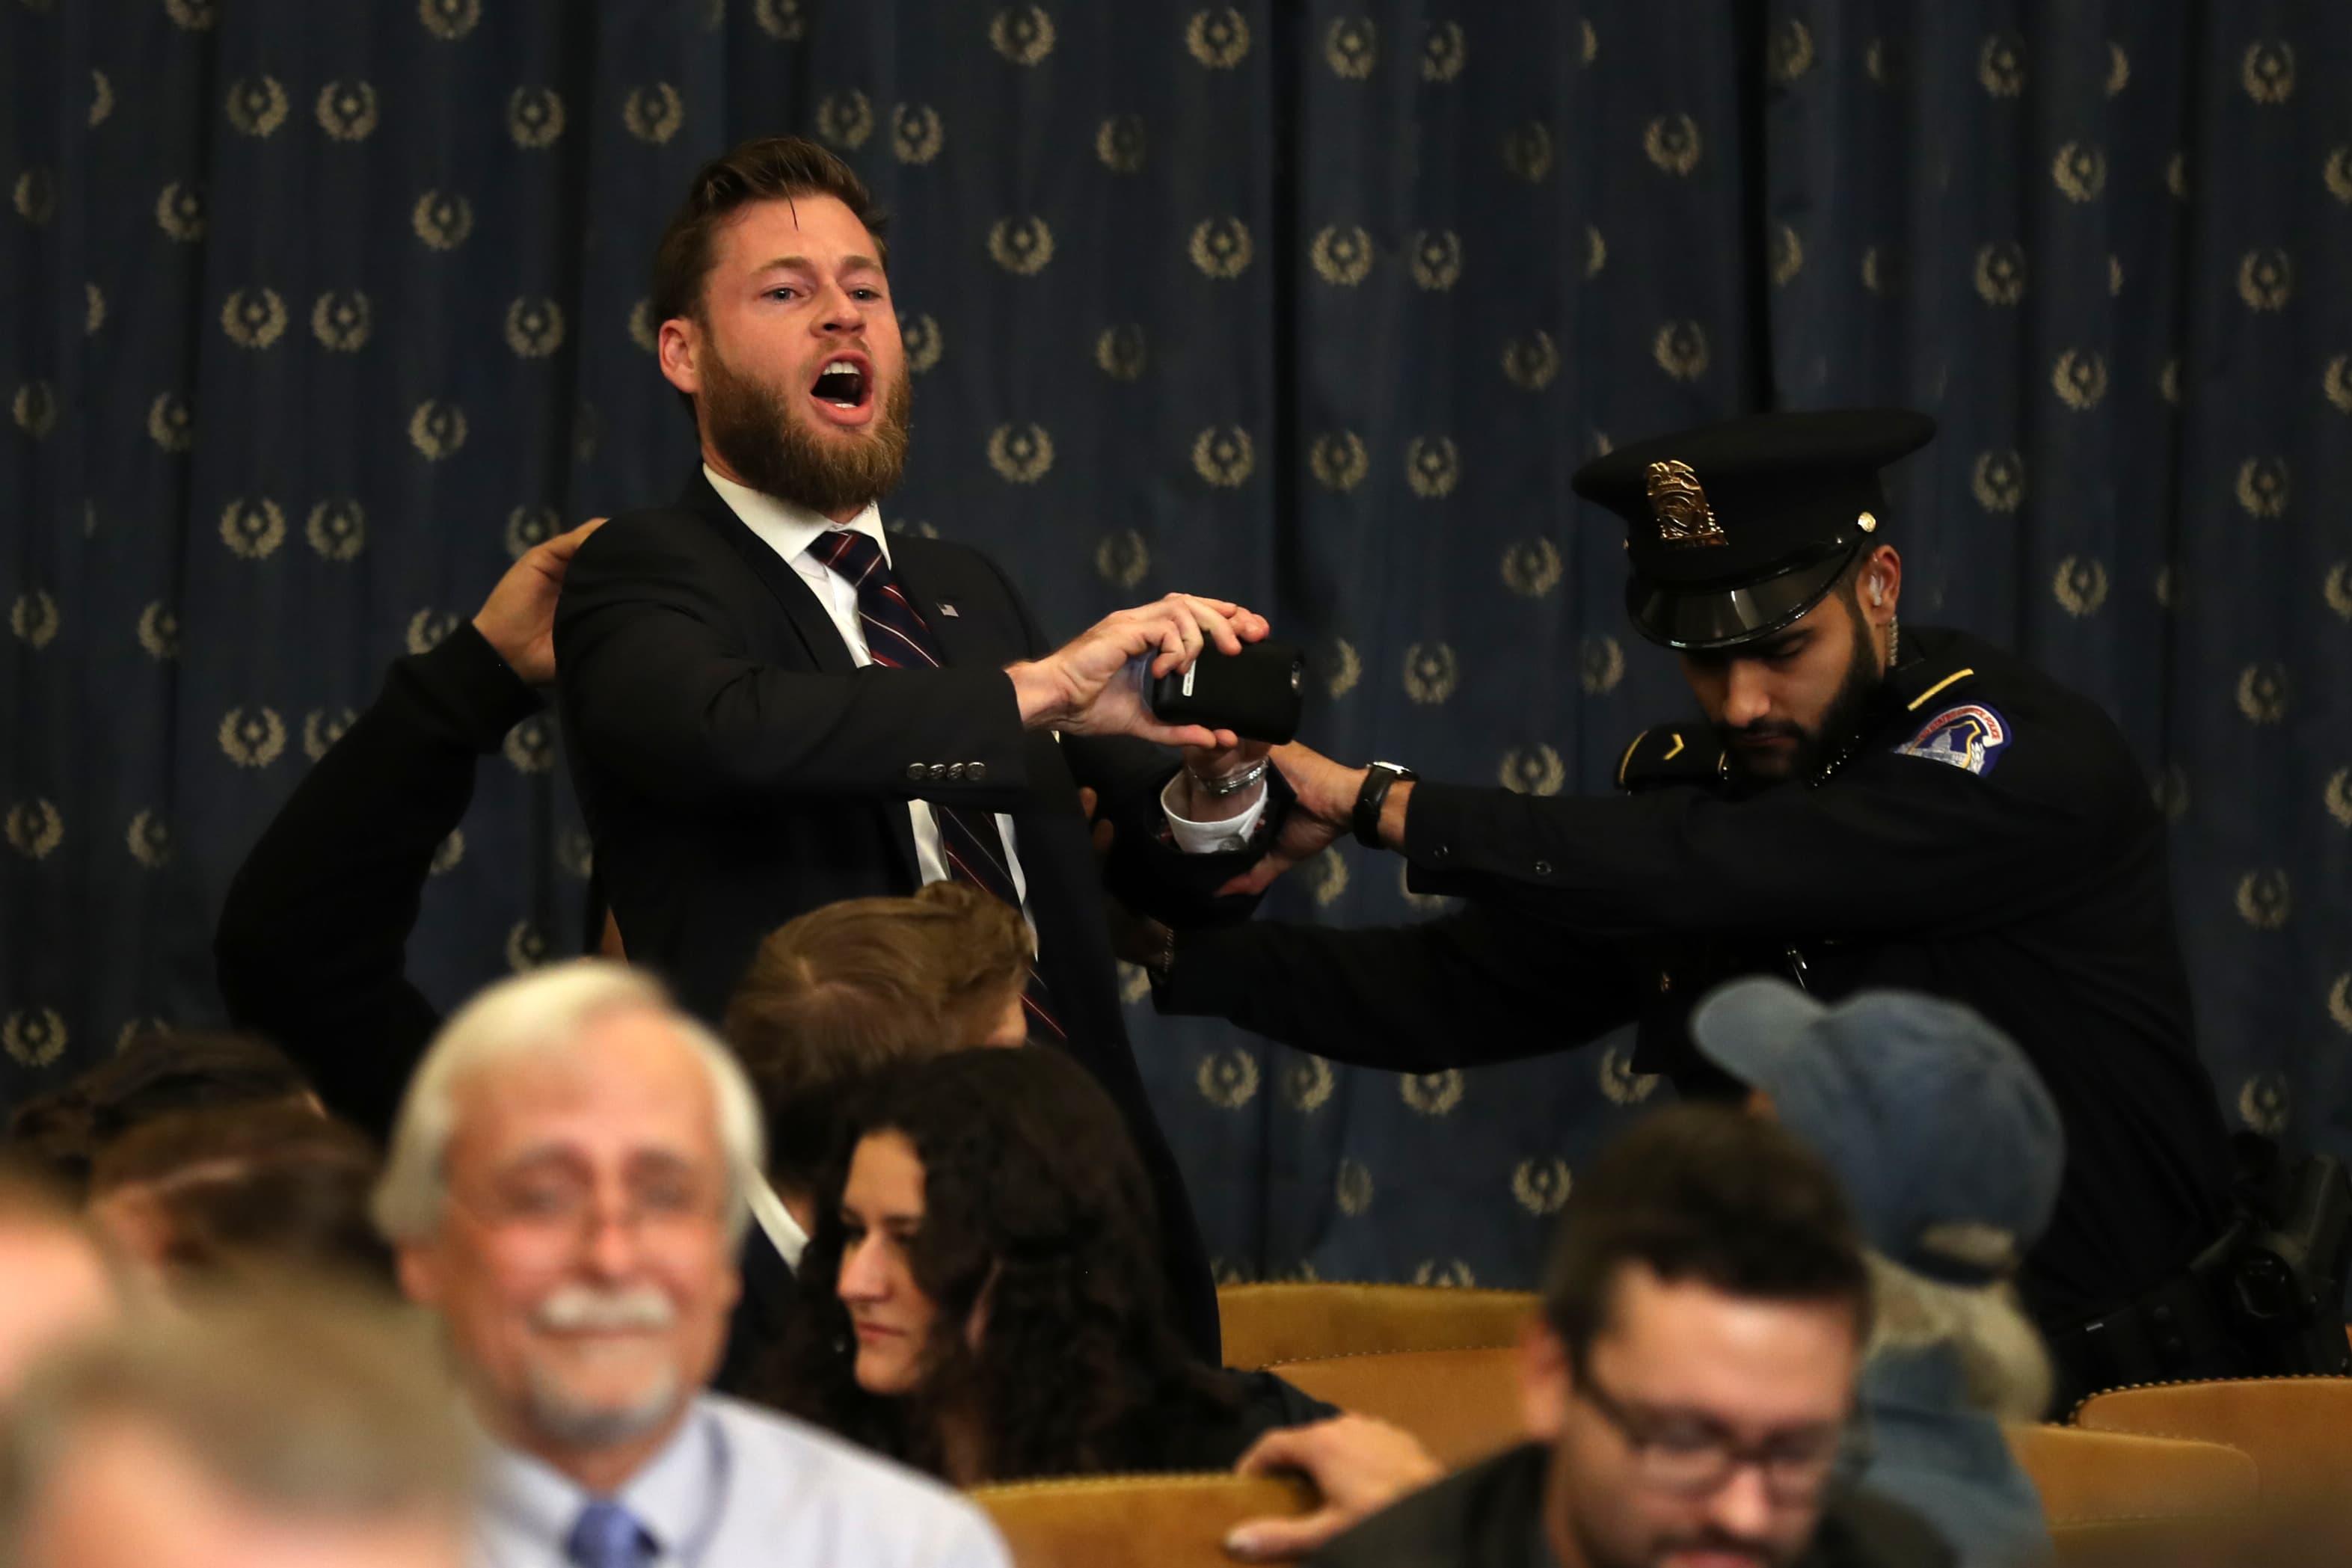 Infowars heckler accuses Nadler of treason during Trump impeachment hearing